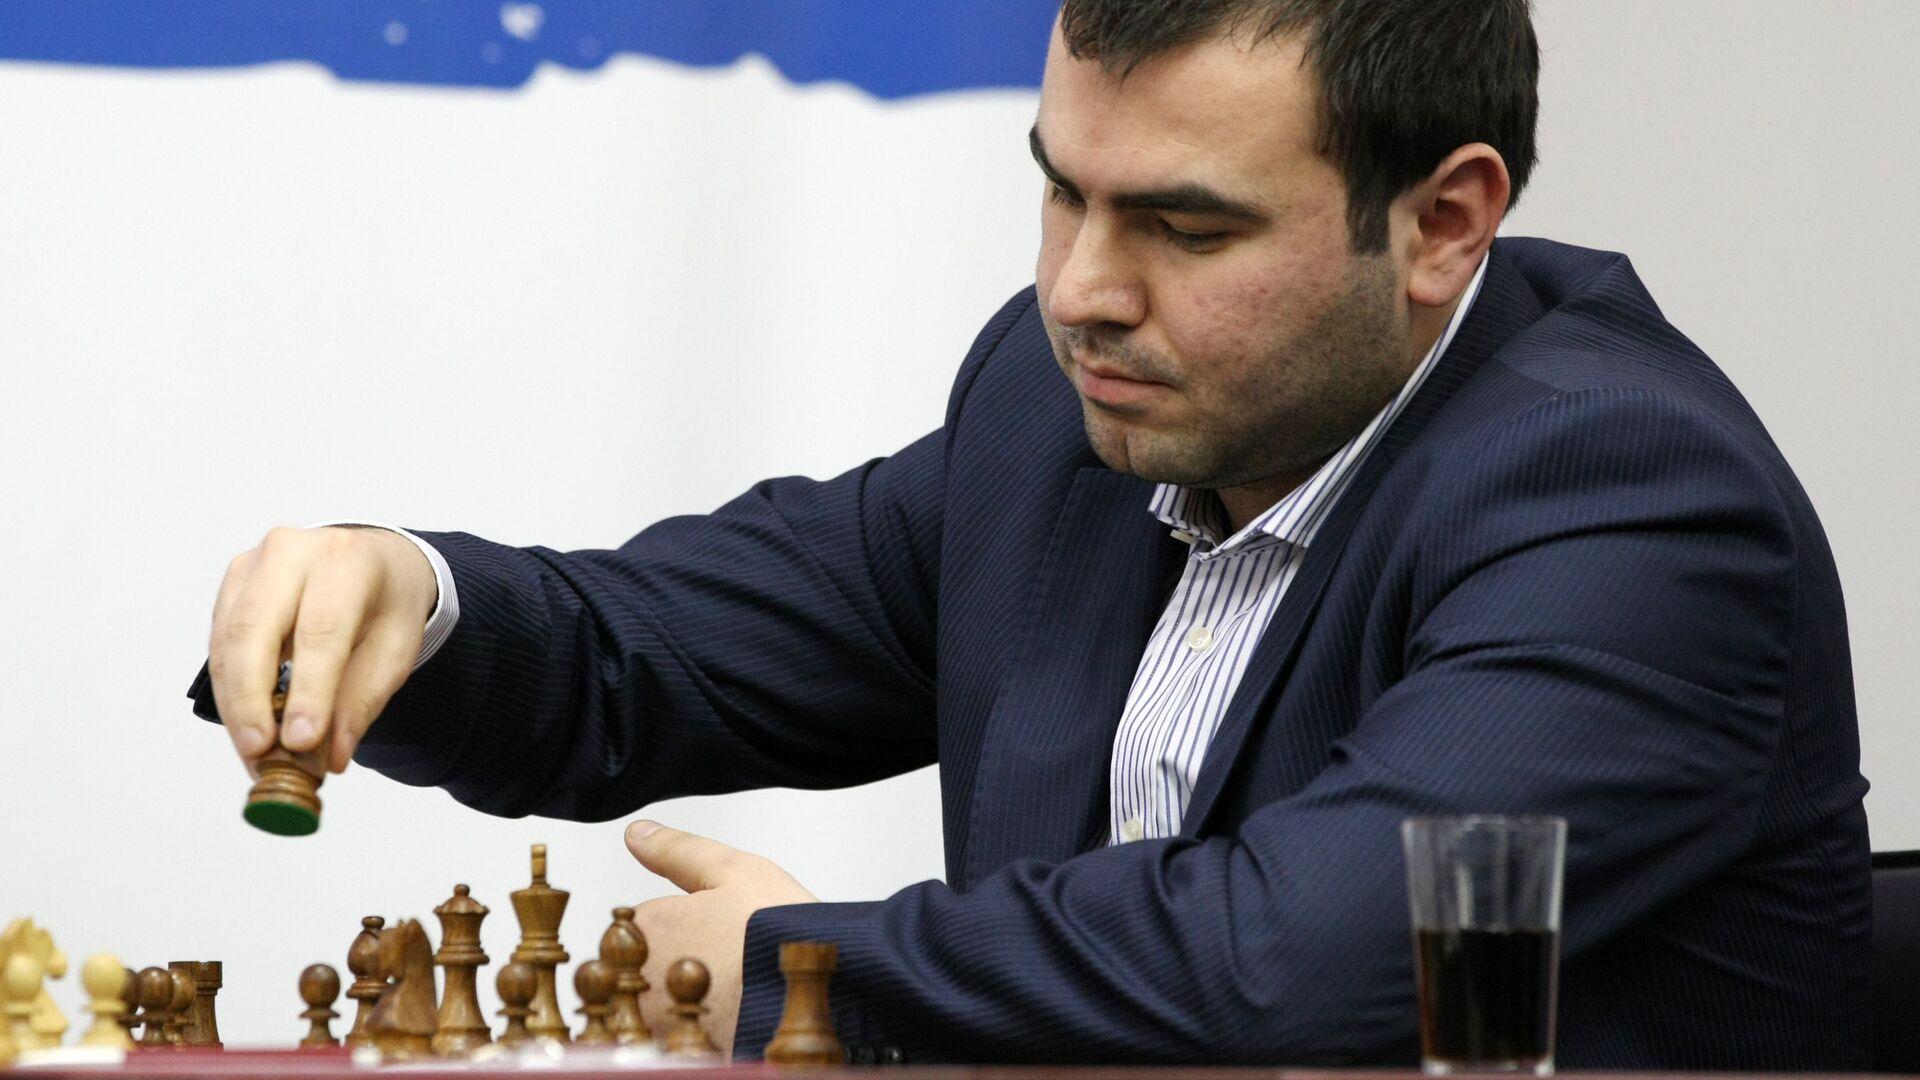 Азербайджанский гроссмейстер Шахрияр Мамедъяров - Sputnik Азербайджан, 1920, 02.08.2021